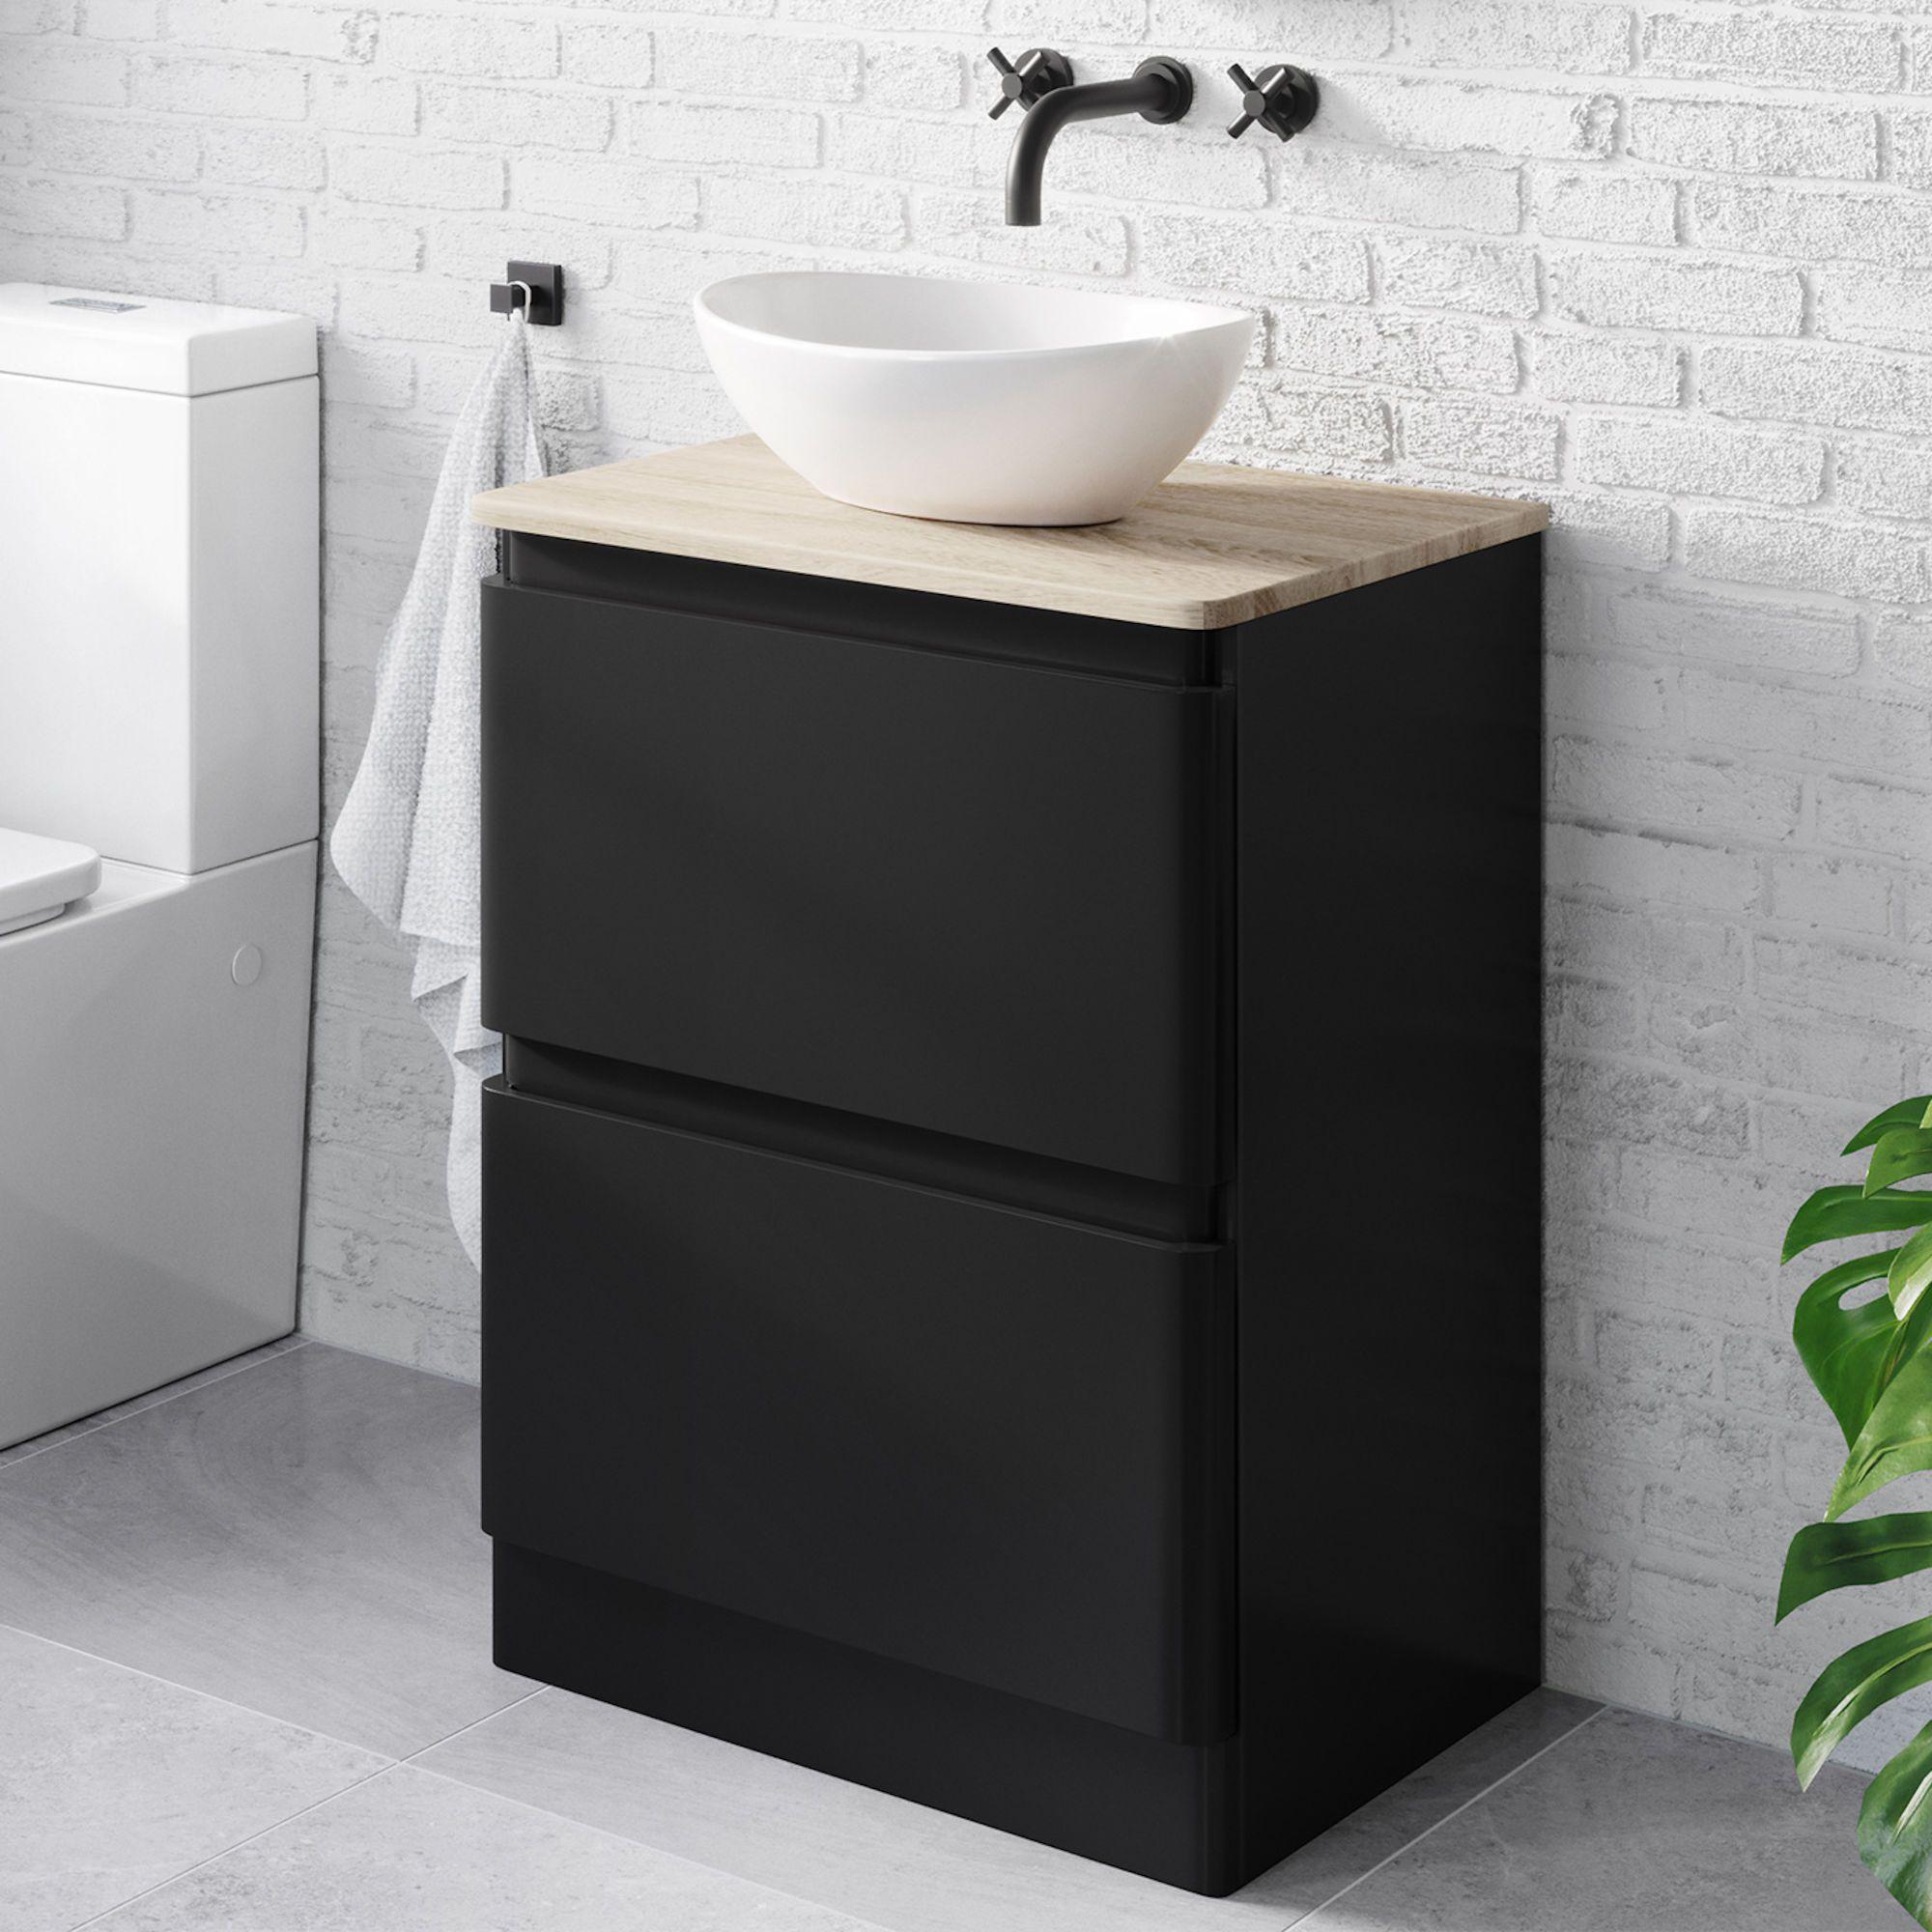 Black Vanity Unit Counter Top Sink